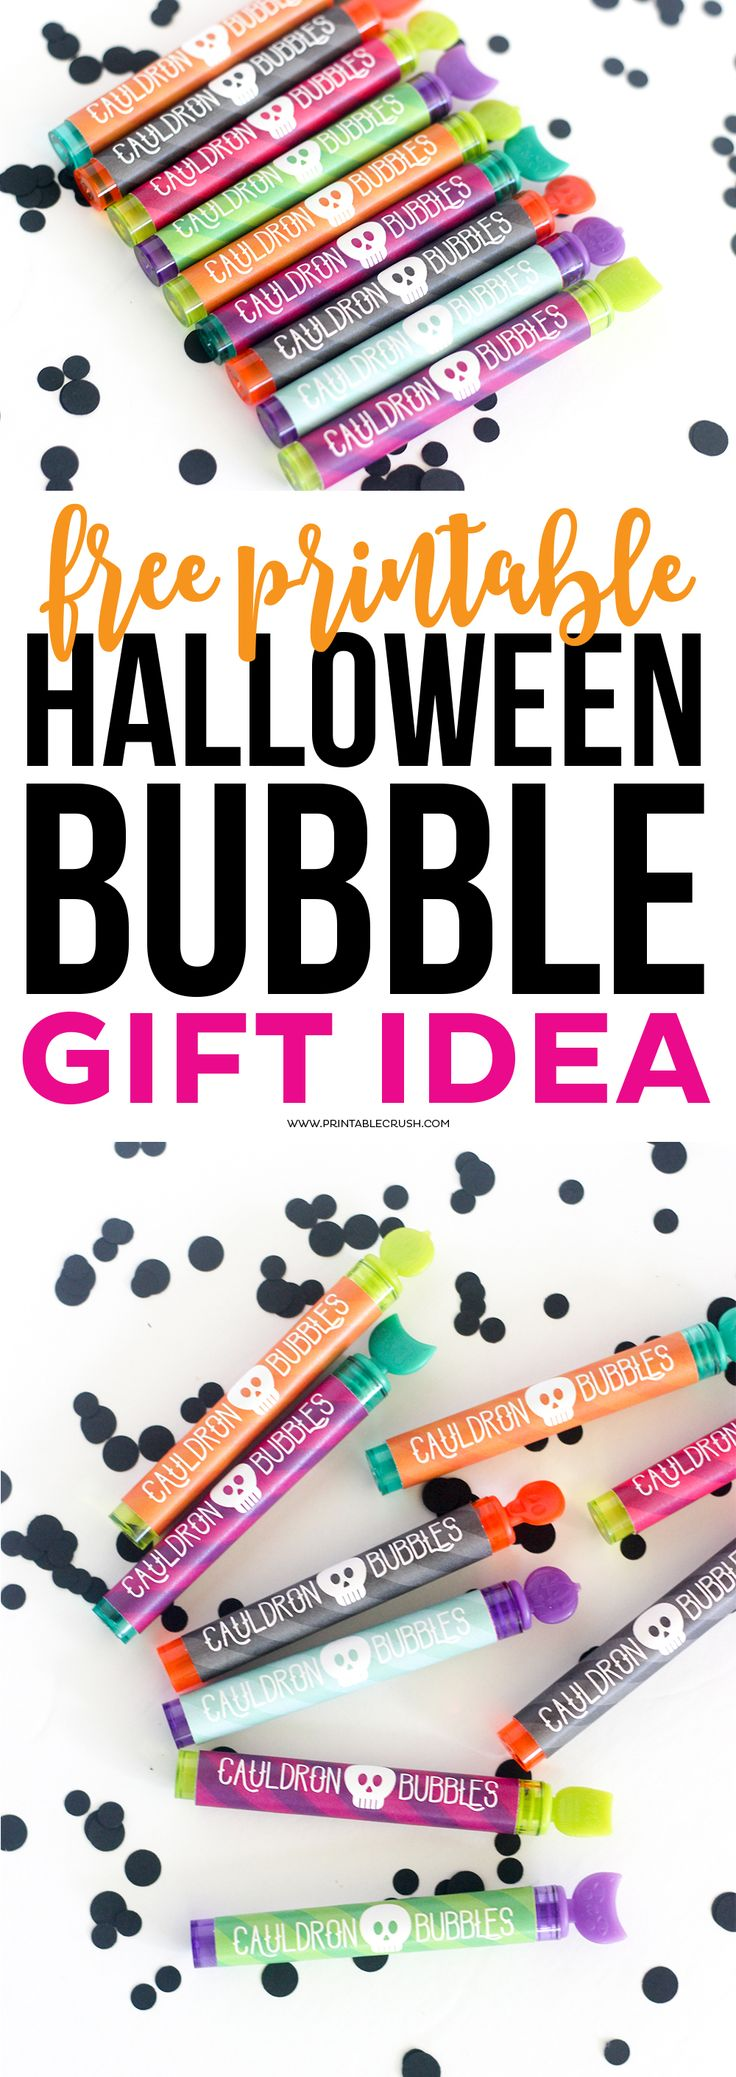 588 best Halloween images on Pinterest